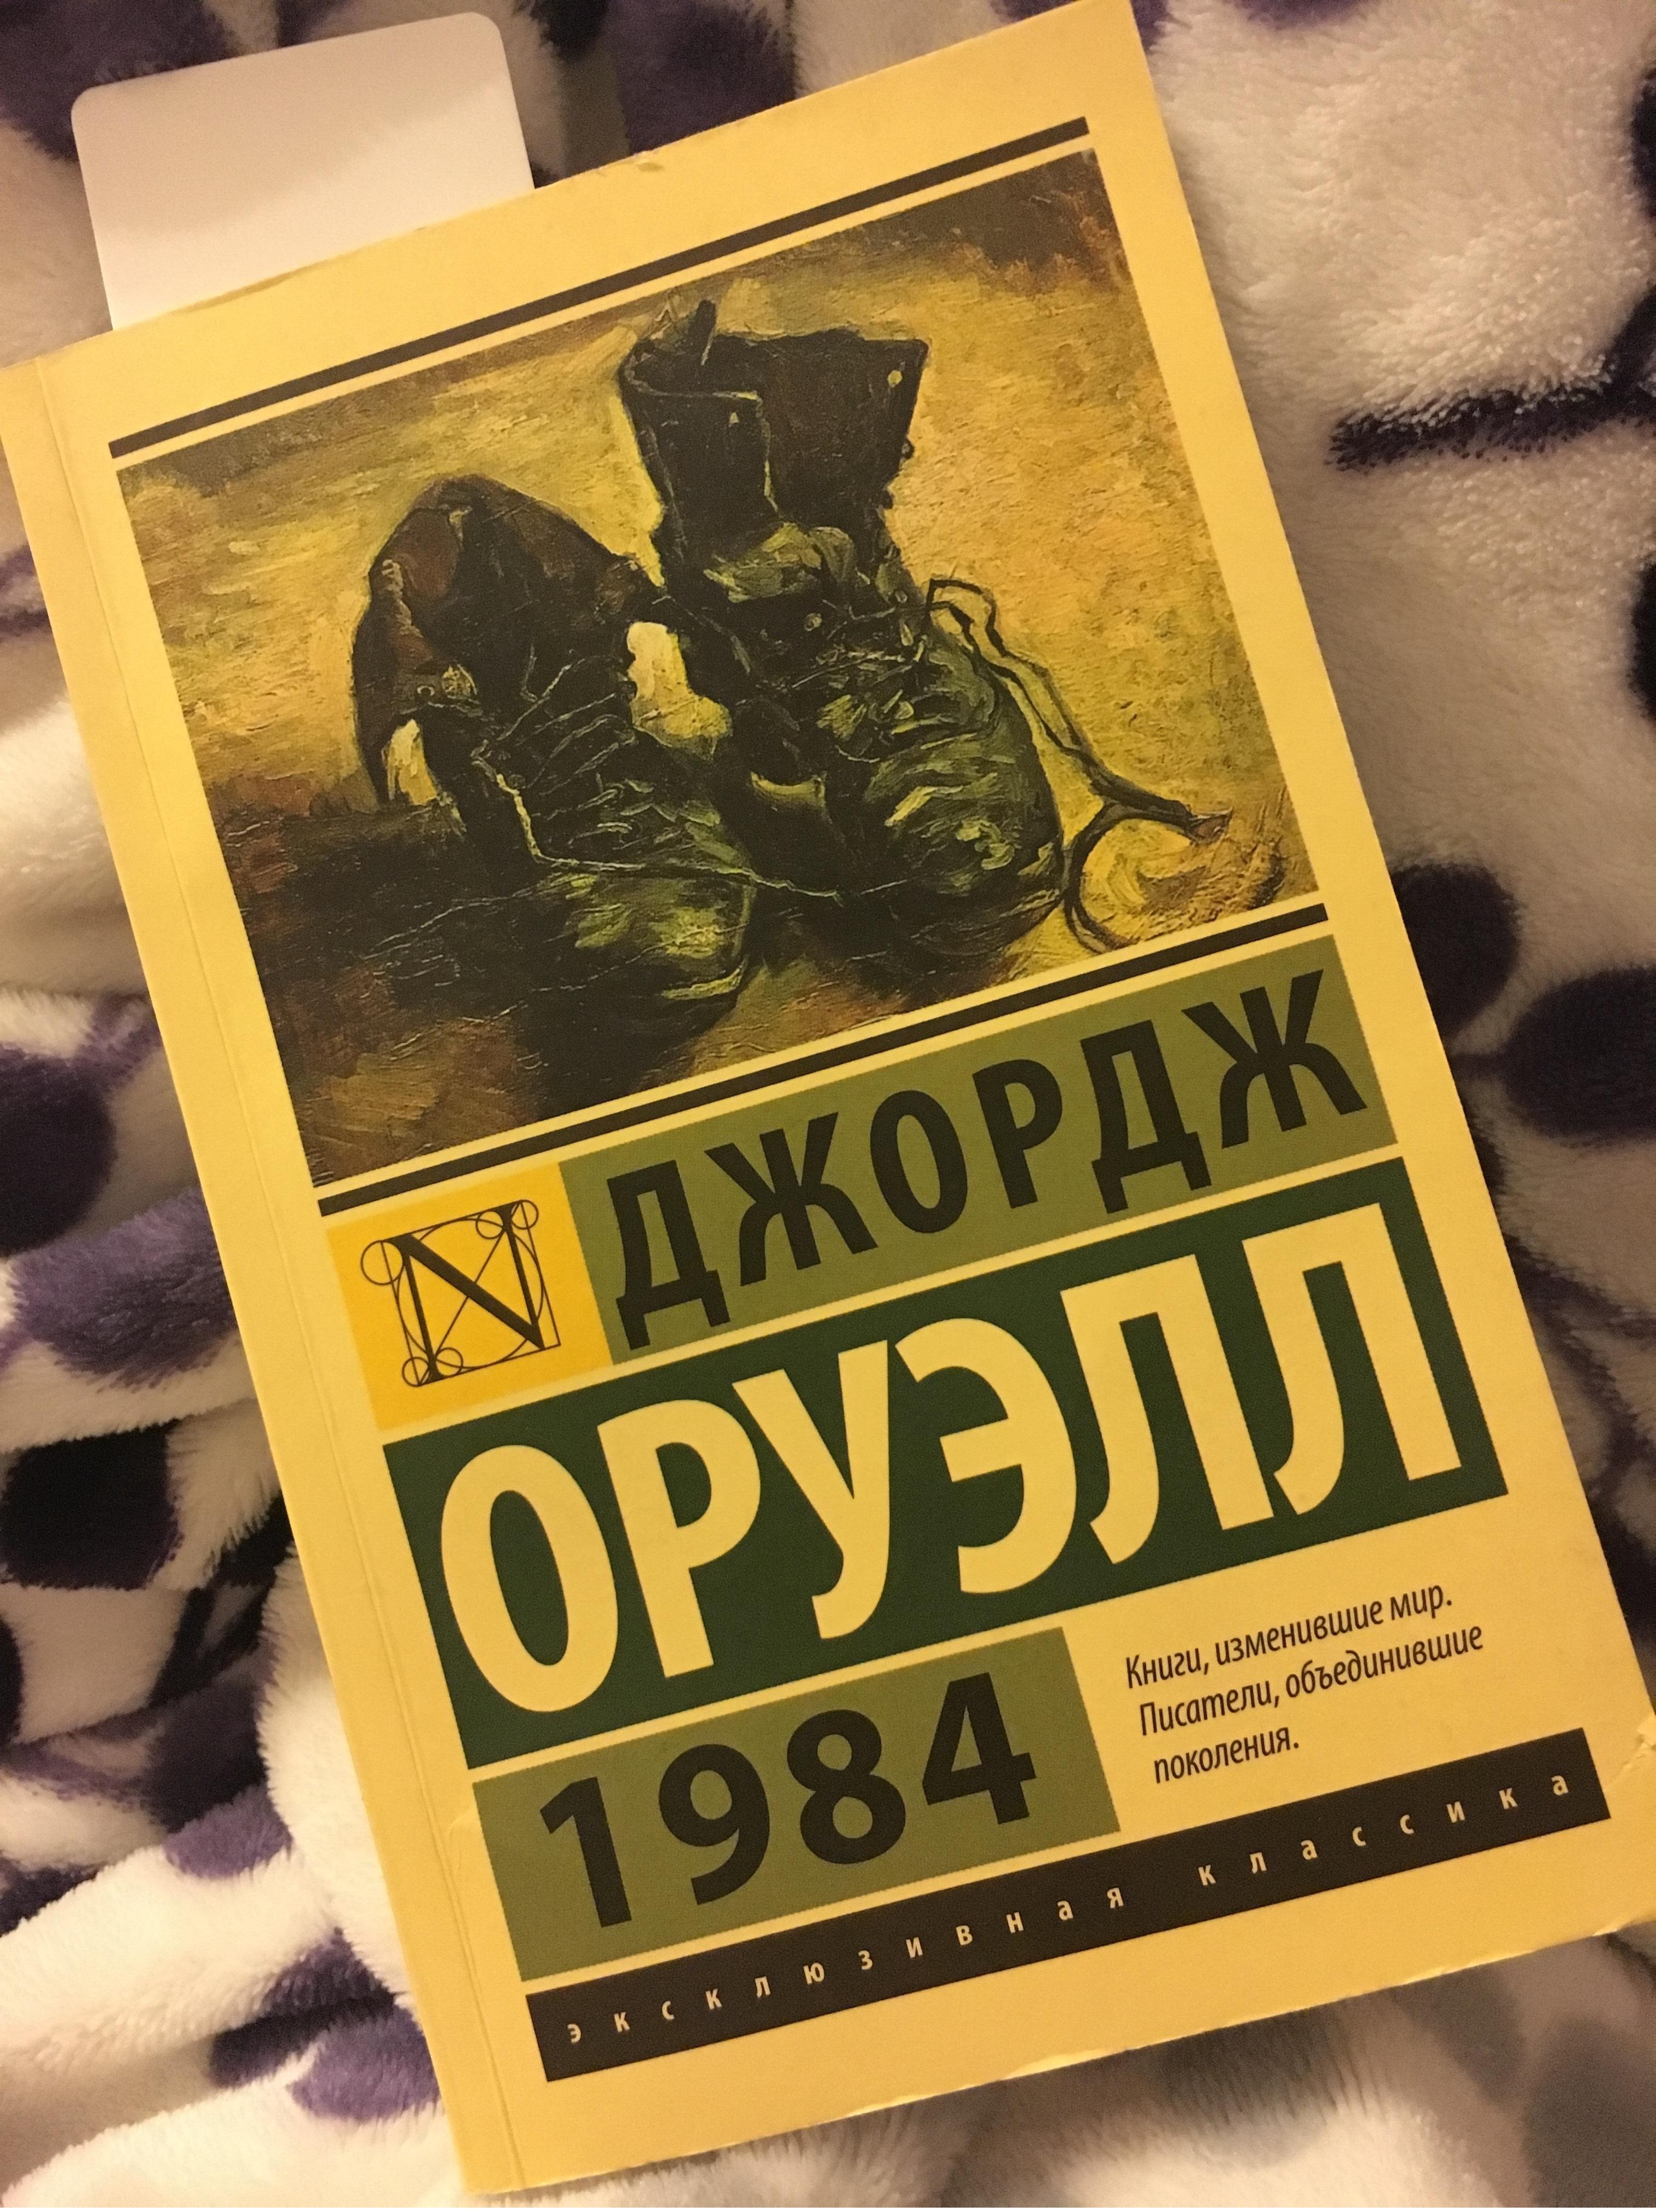 1984 джордж оруэлл рецензия на книгу 2636